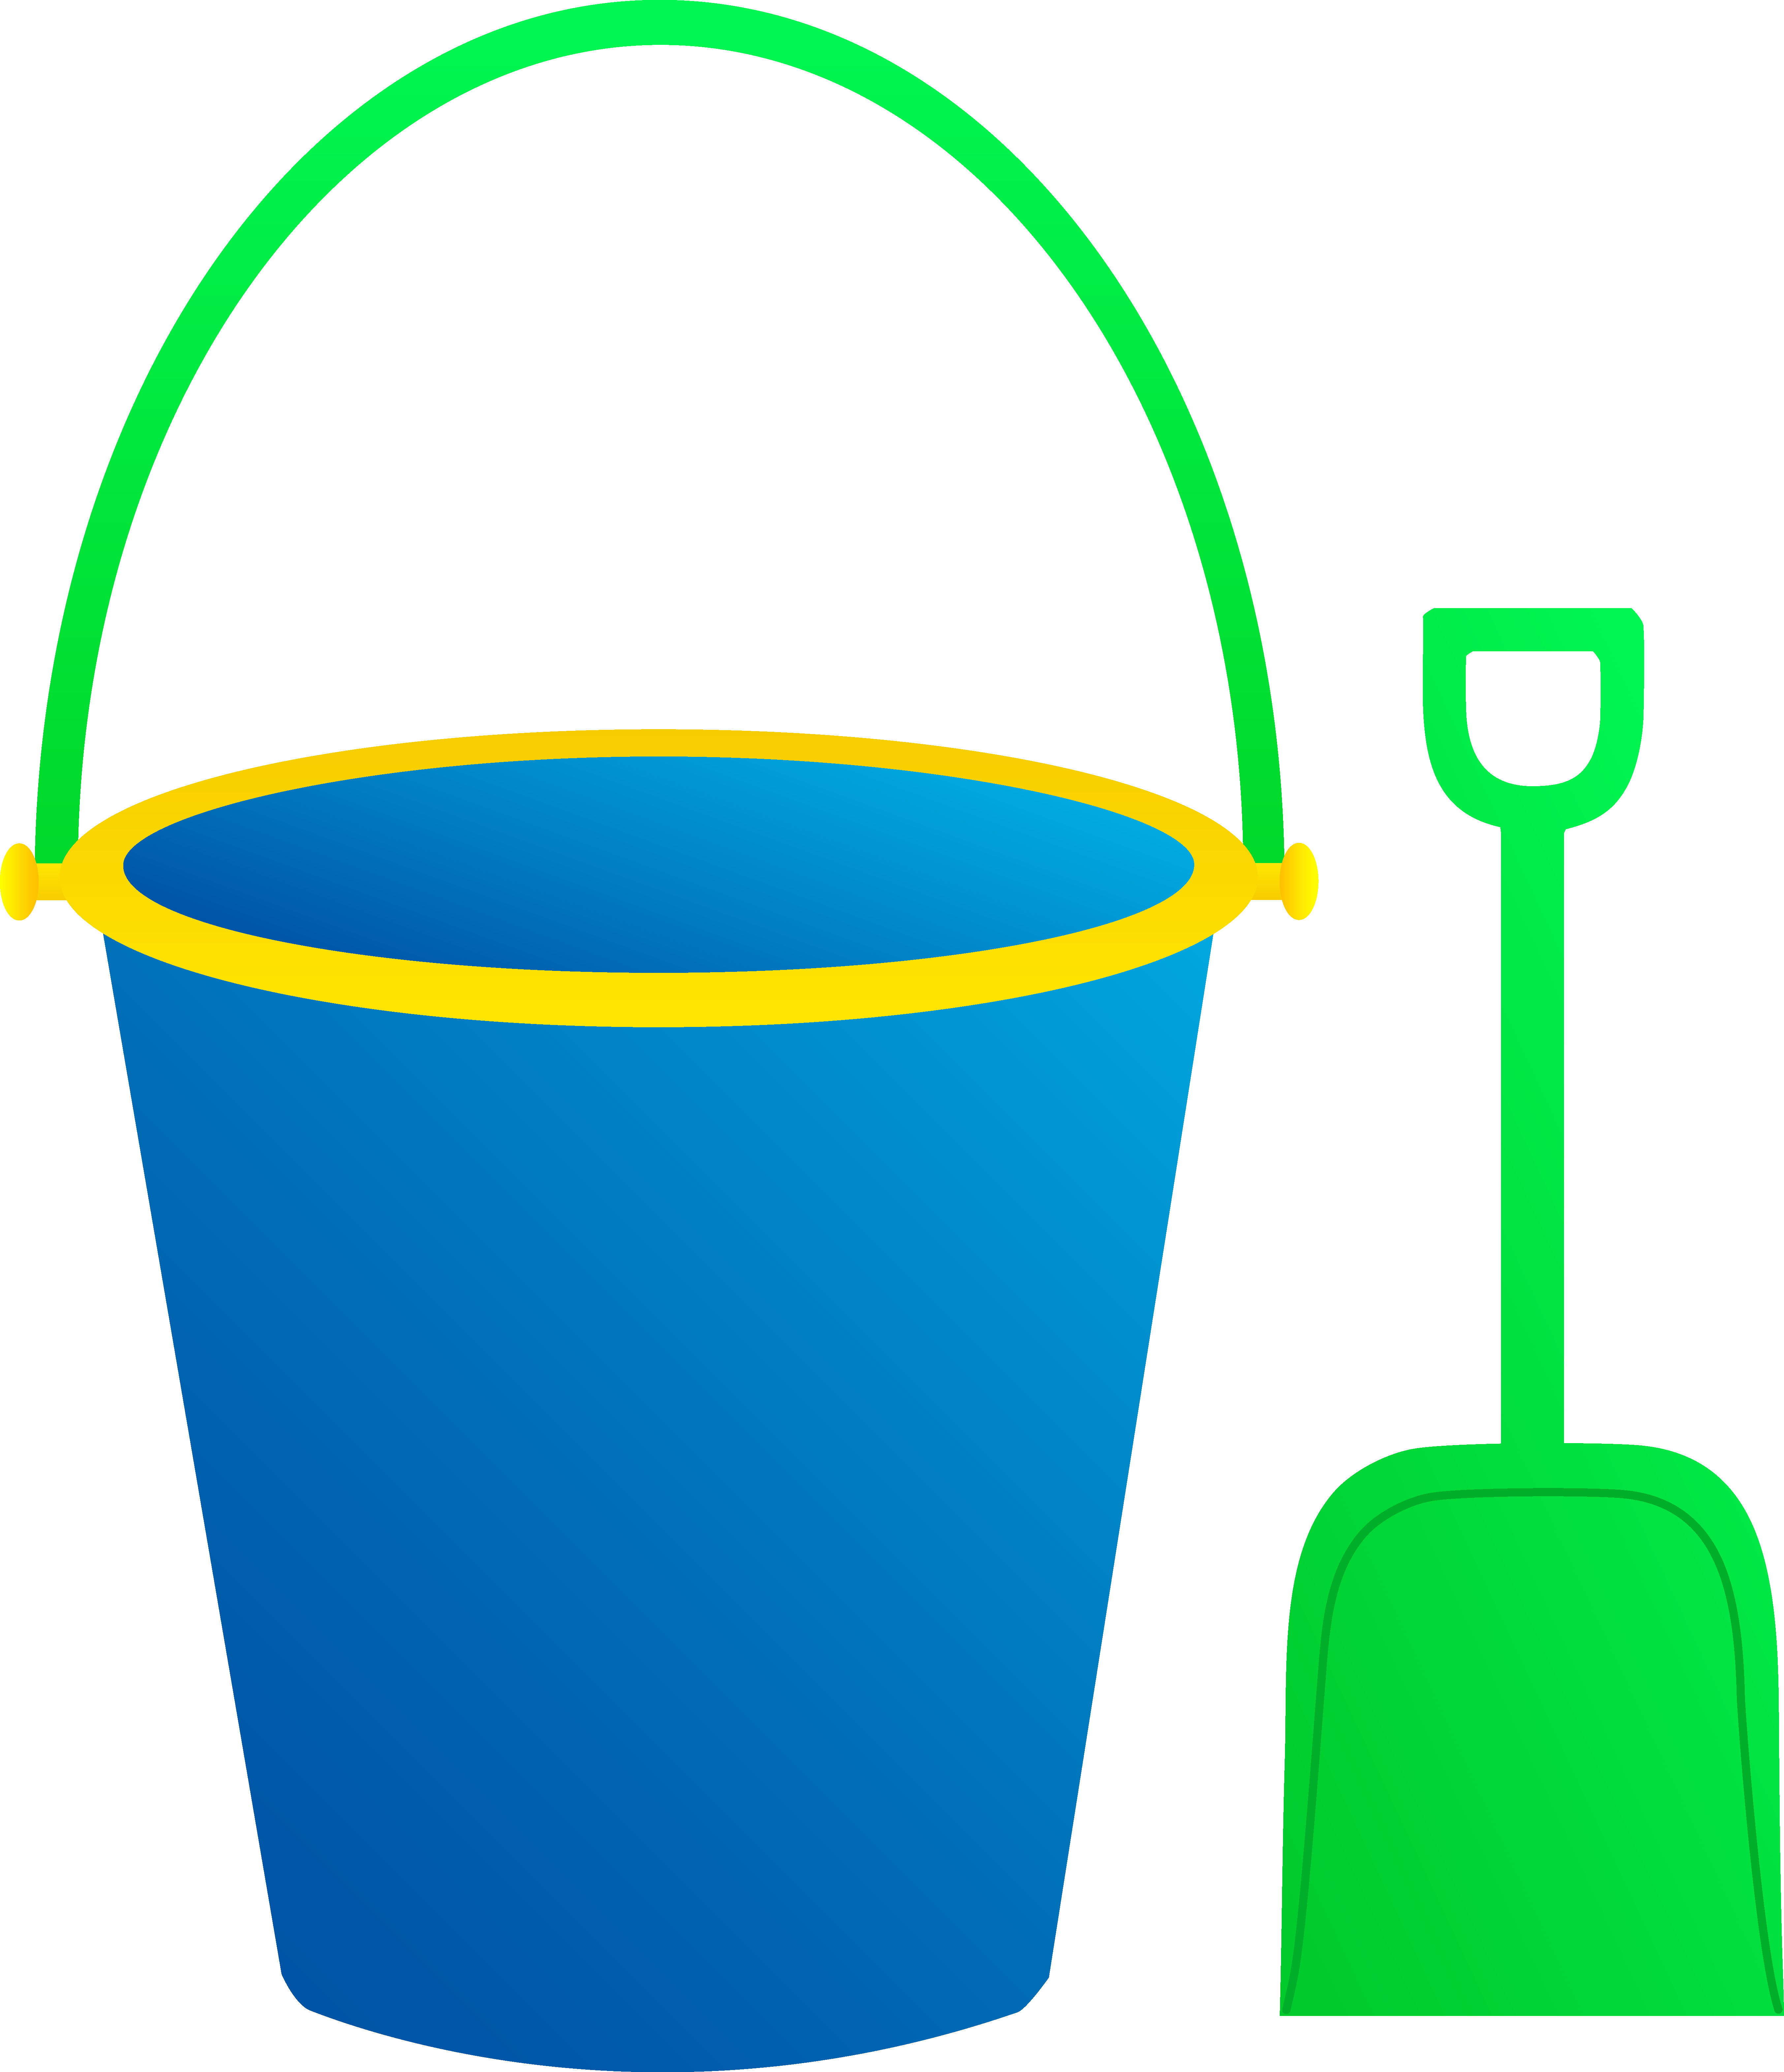 5409x6283 Blue Pail With Green Shovel